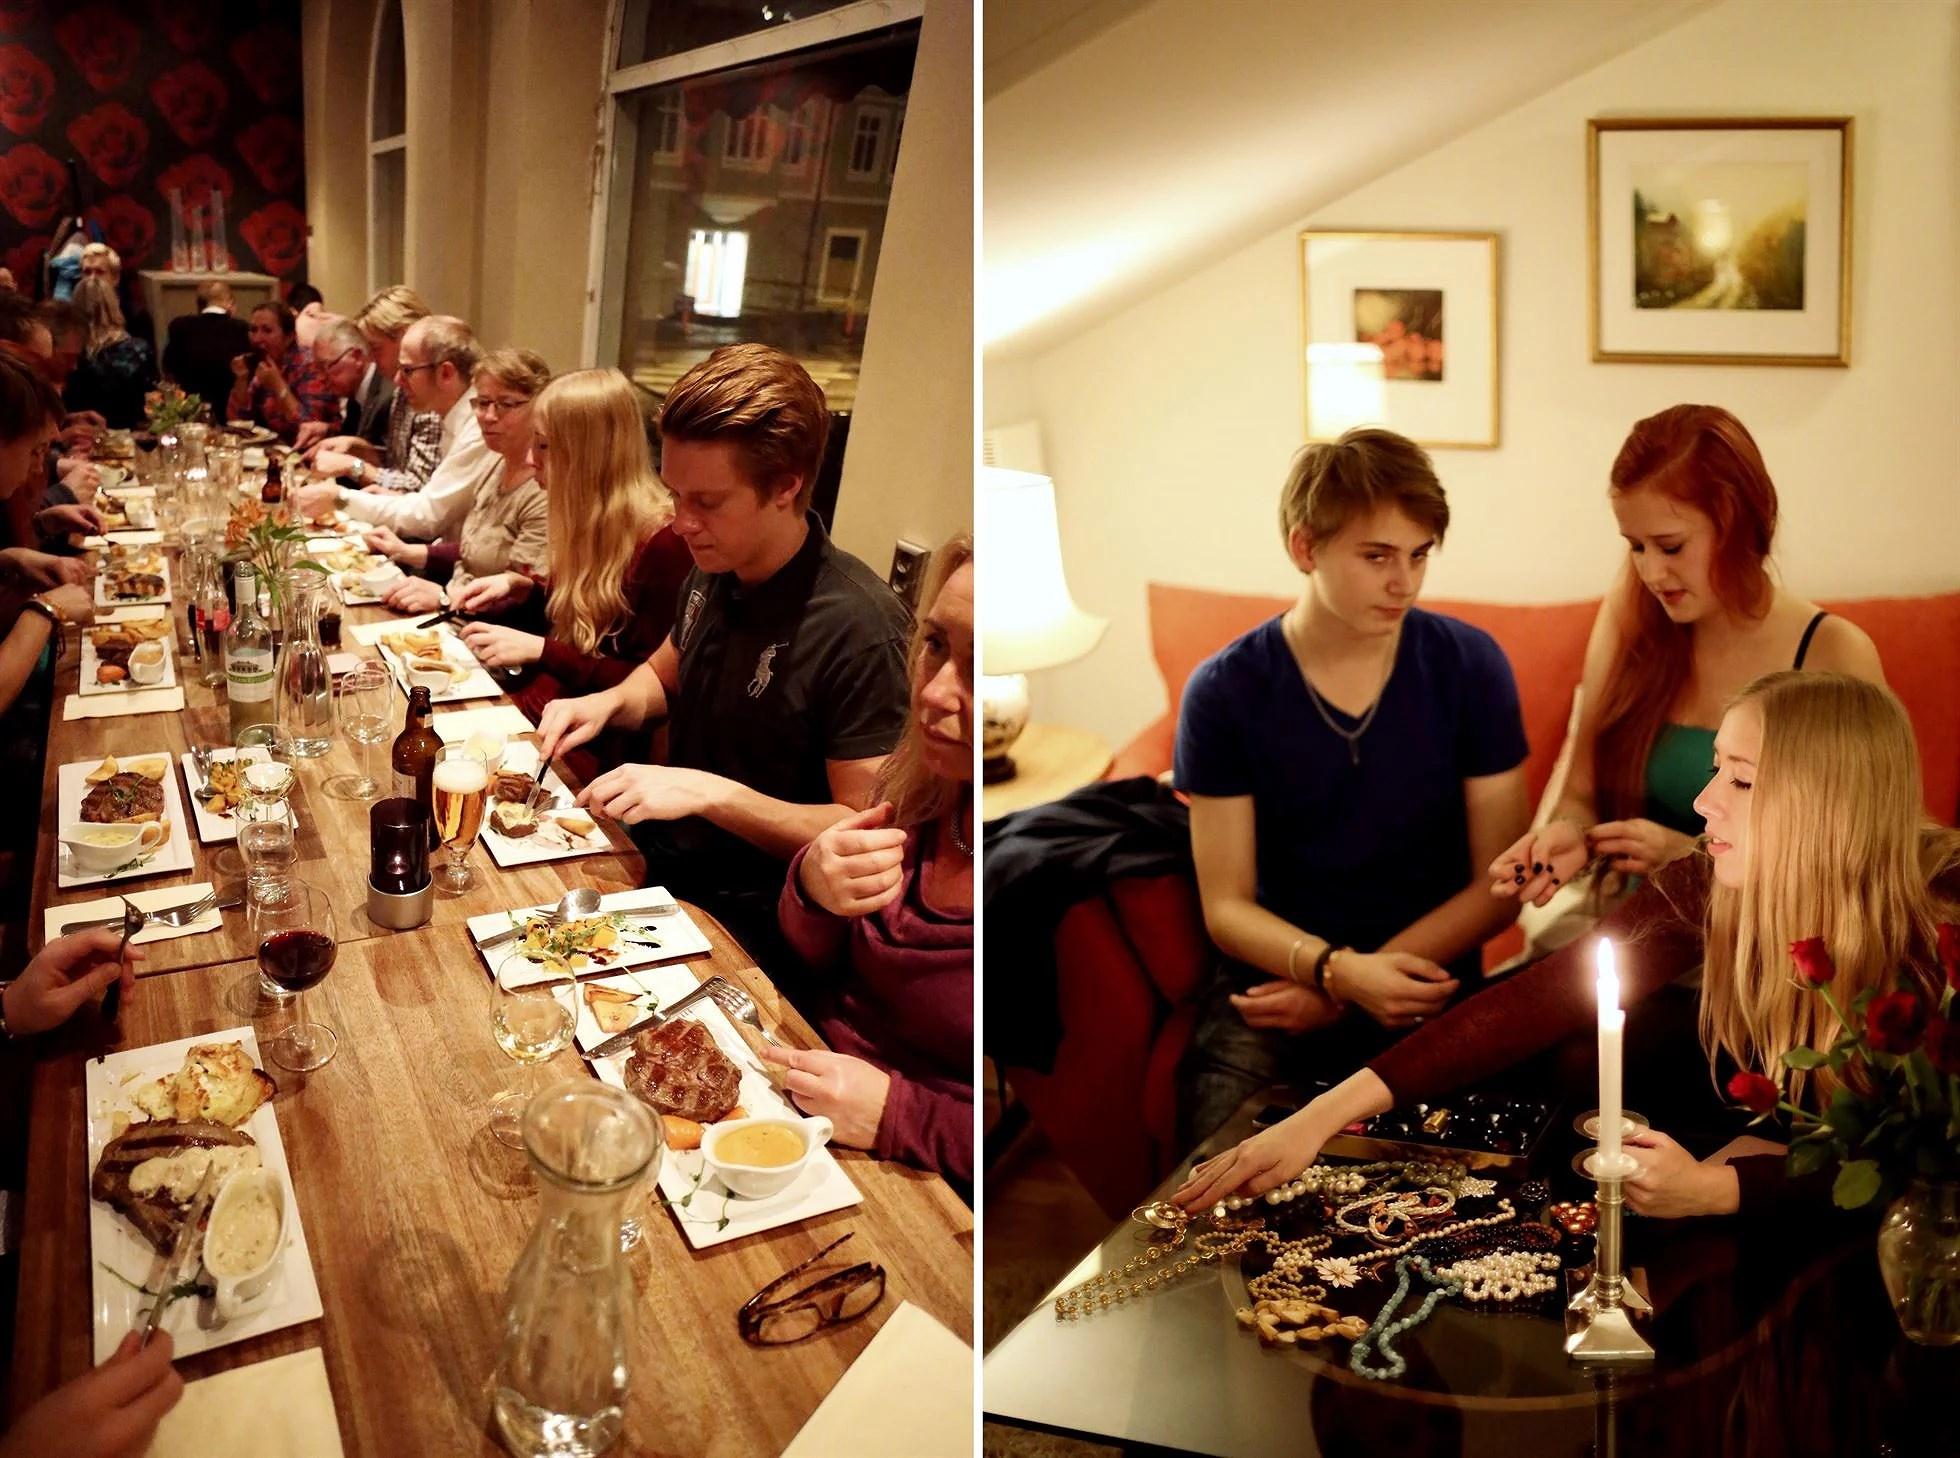 Vardagsbilder höst & vinter 20143(2)